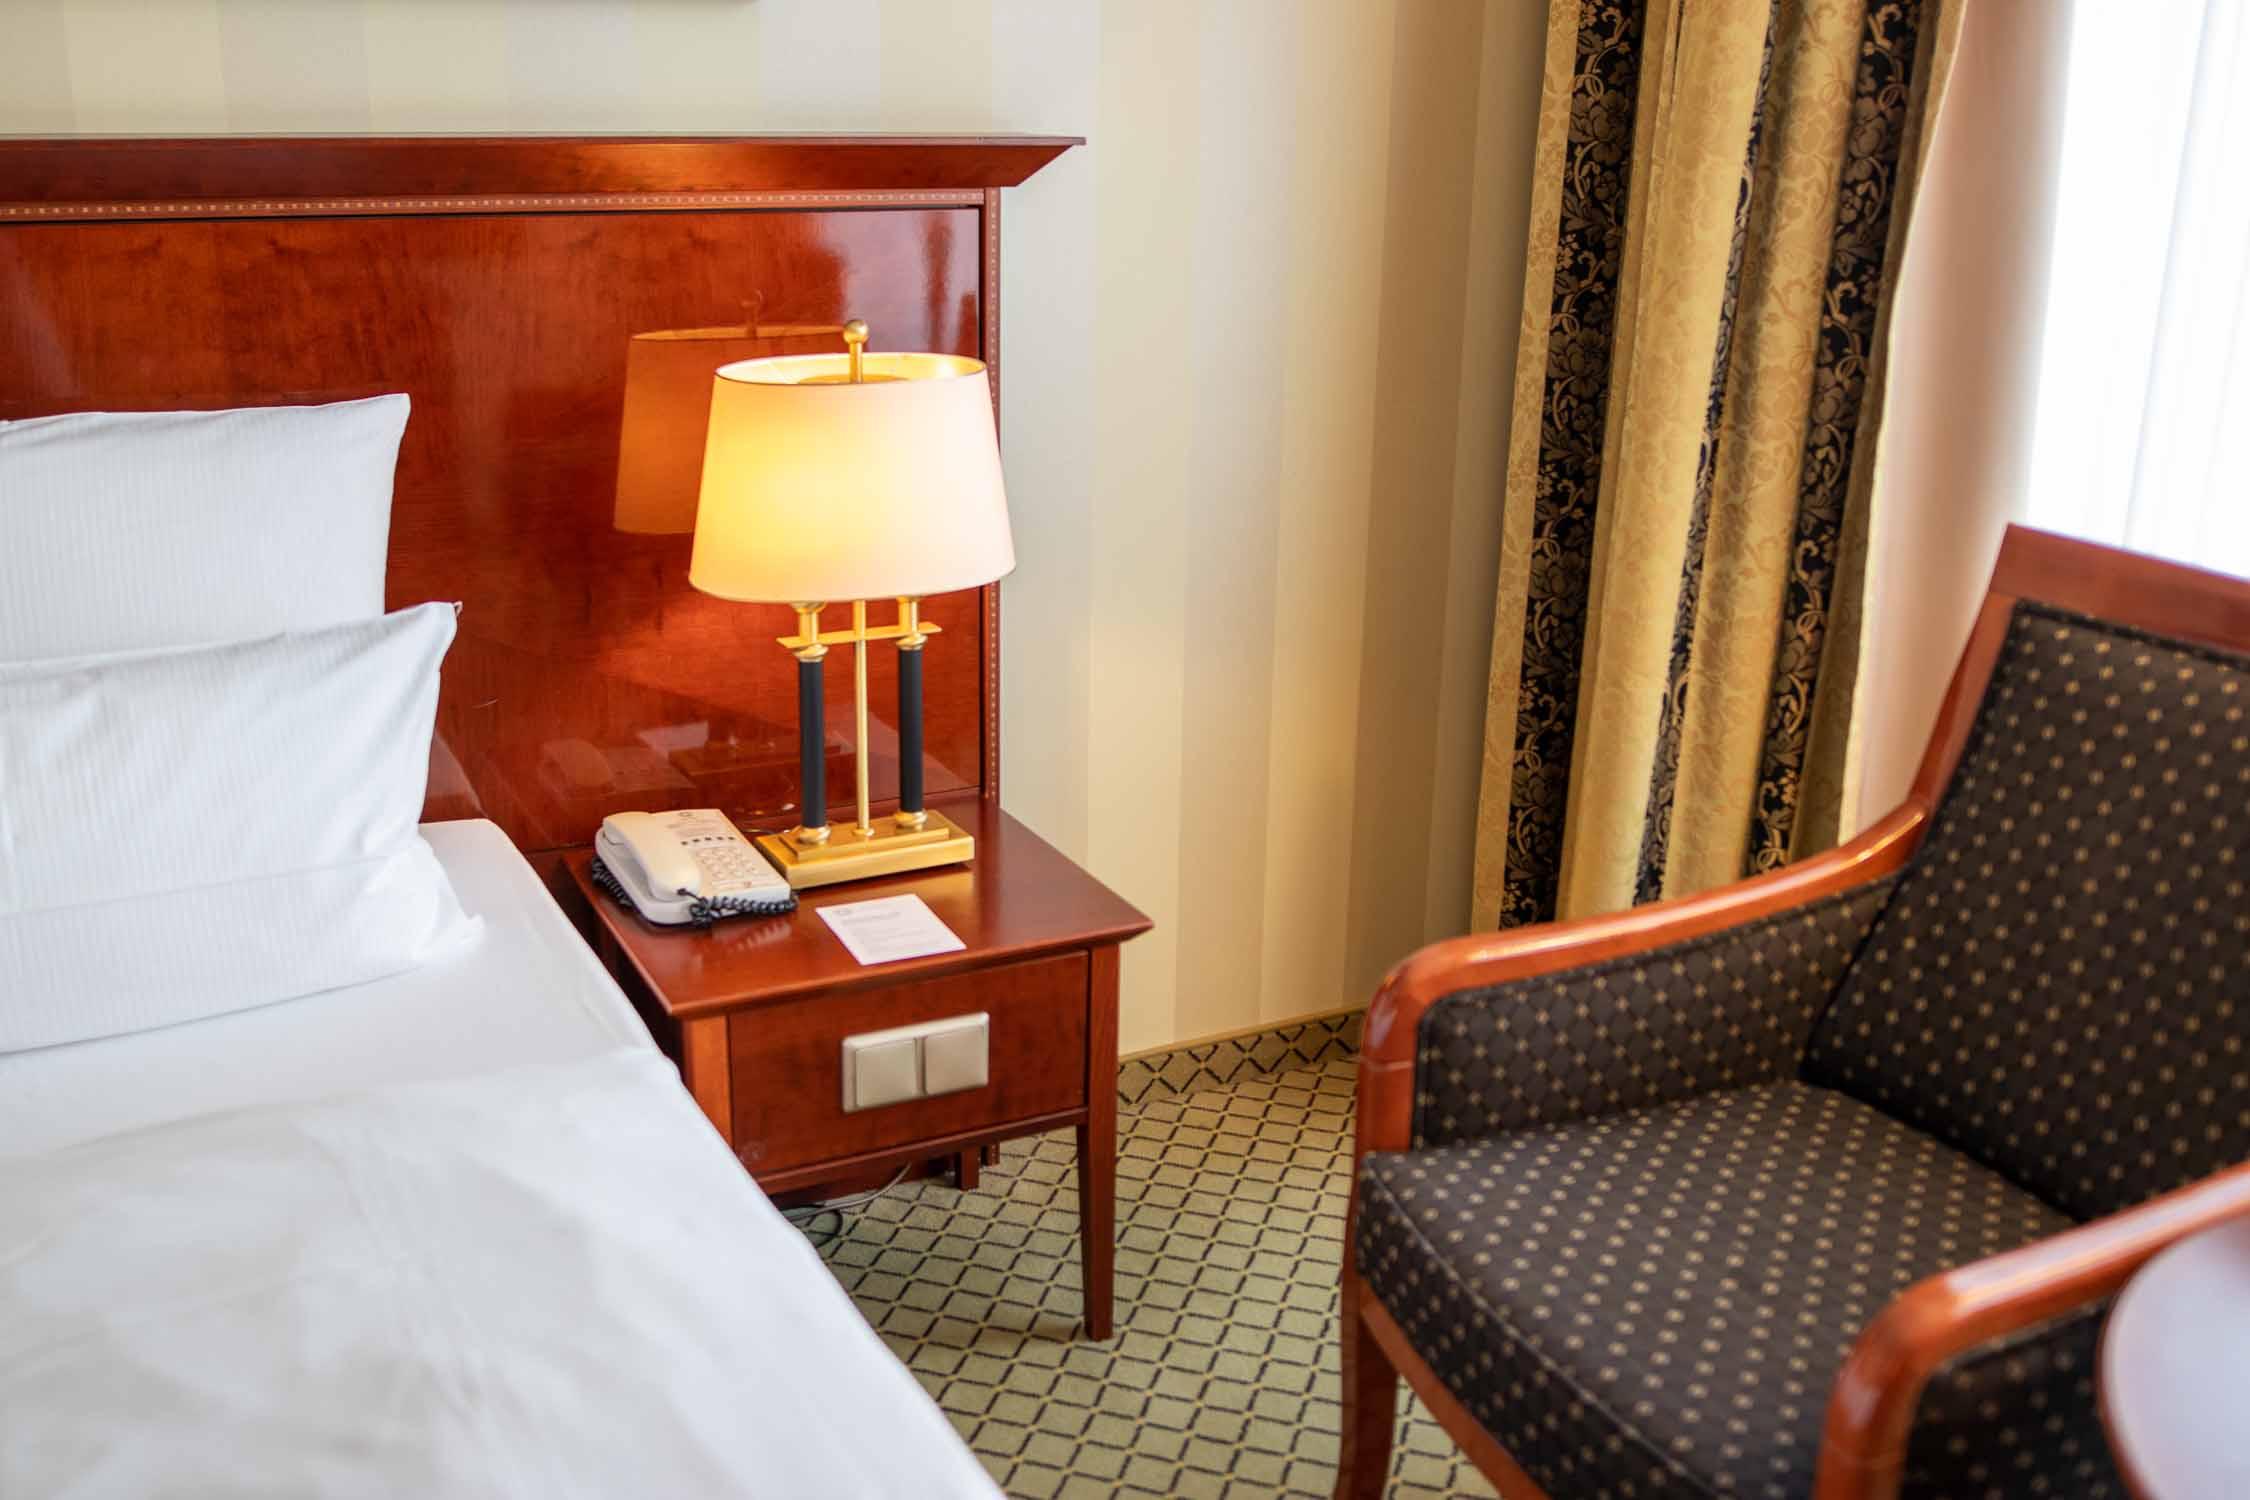 Zimmer JW Marriott Hotel Berlin Erfahrungsbericht-2